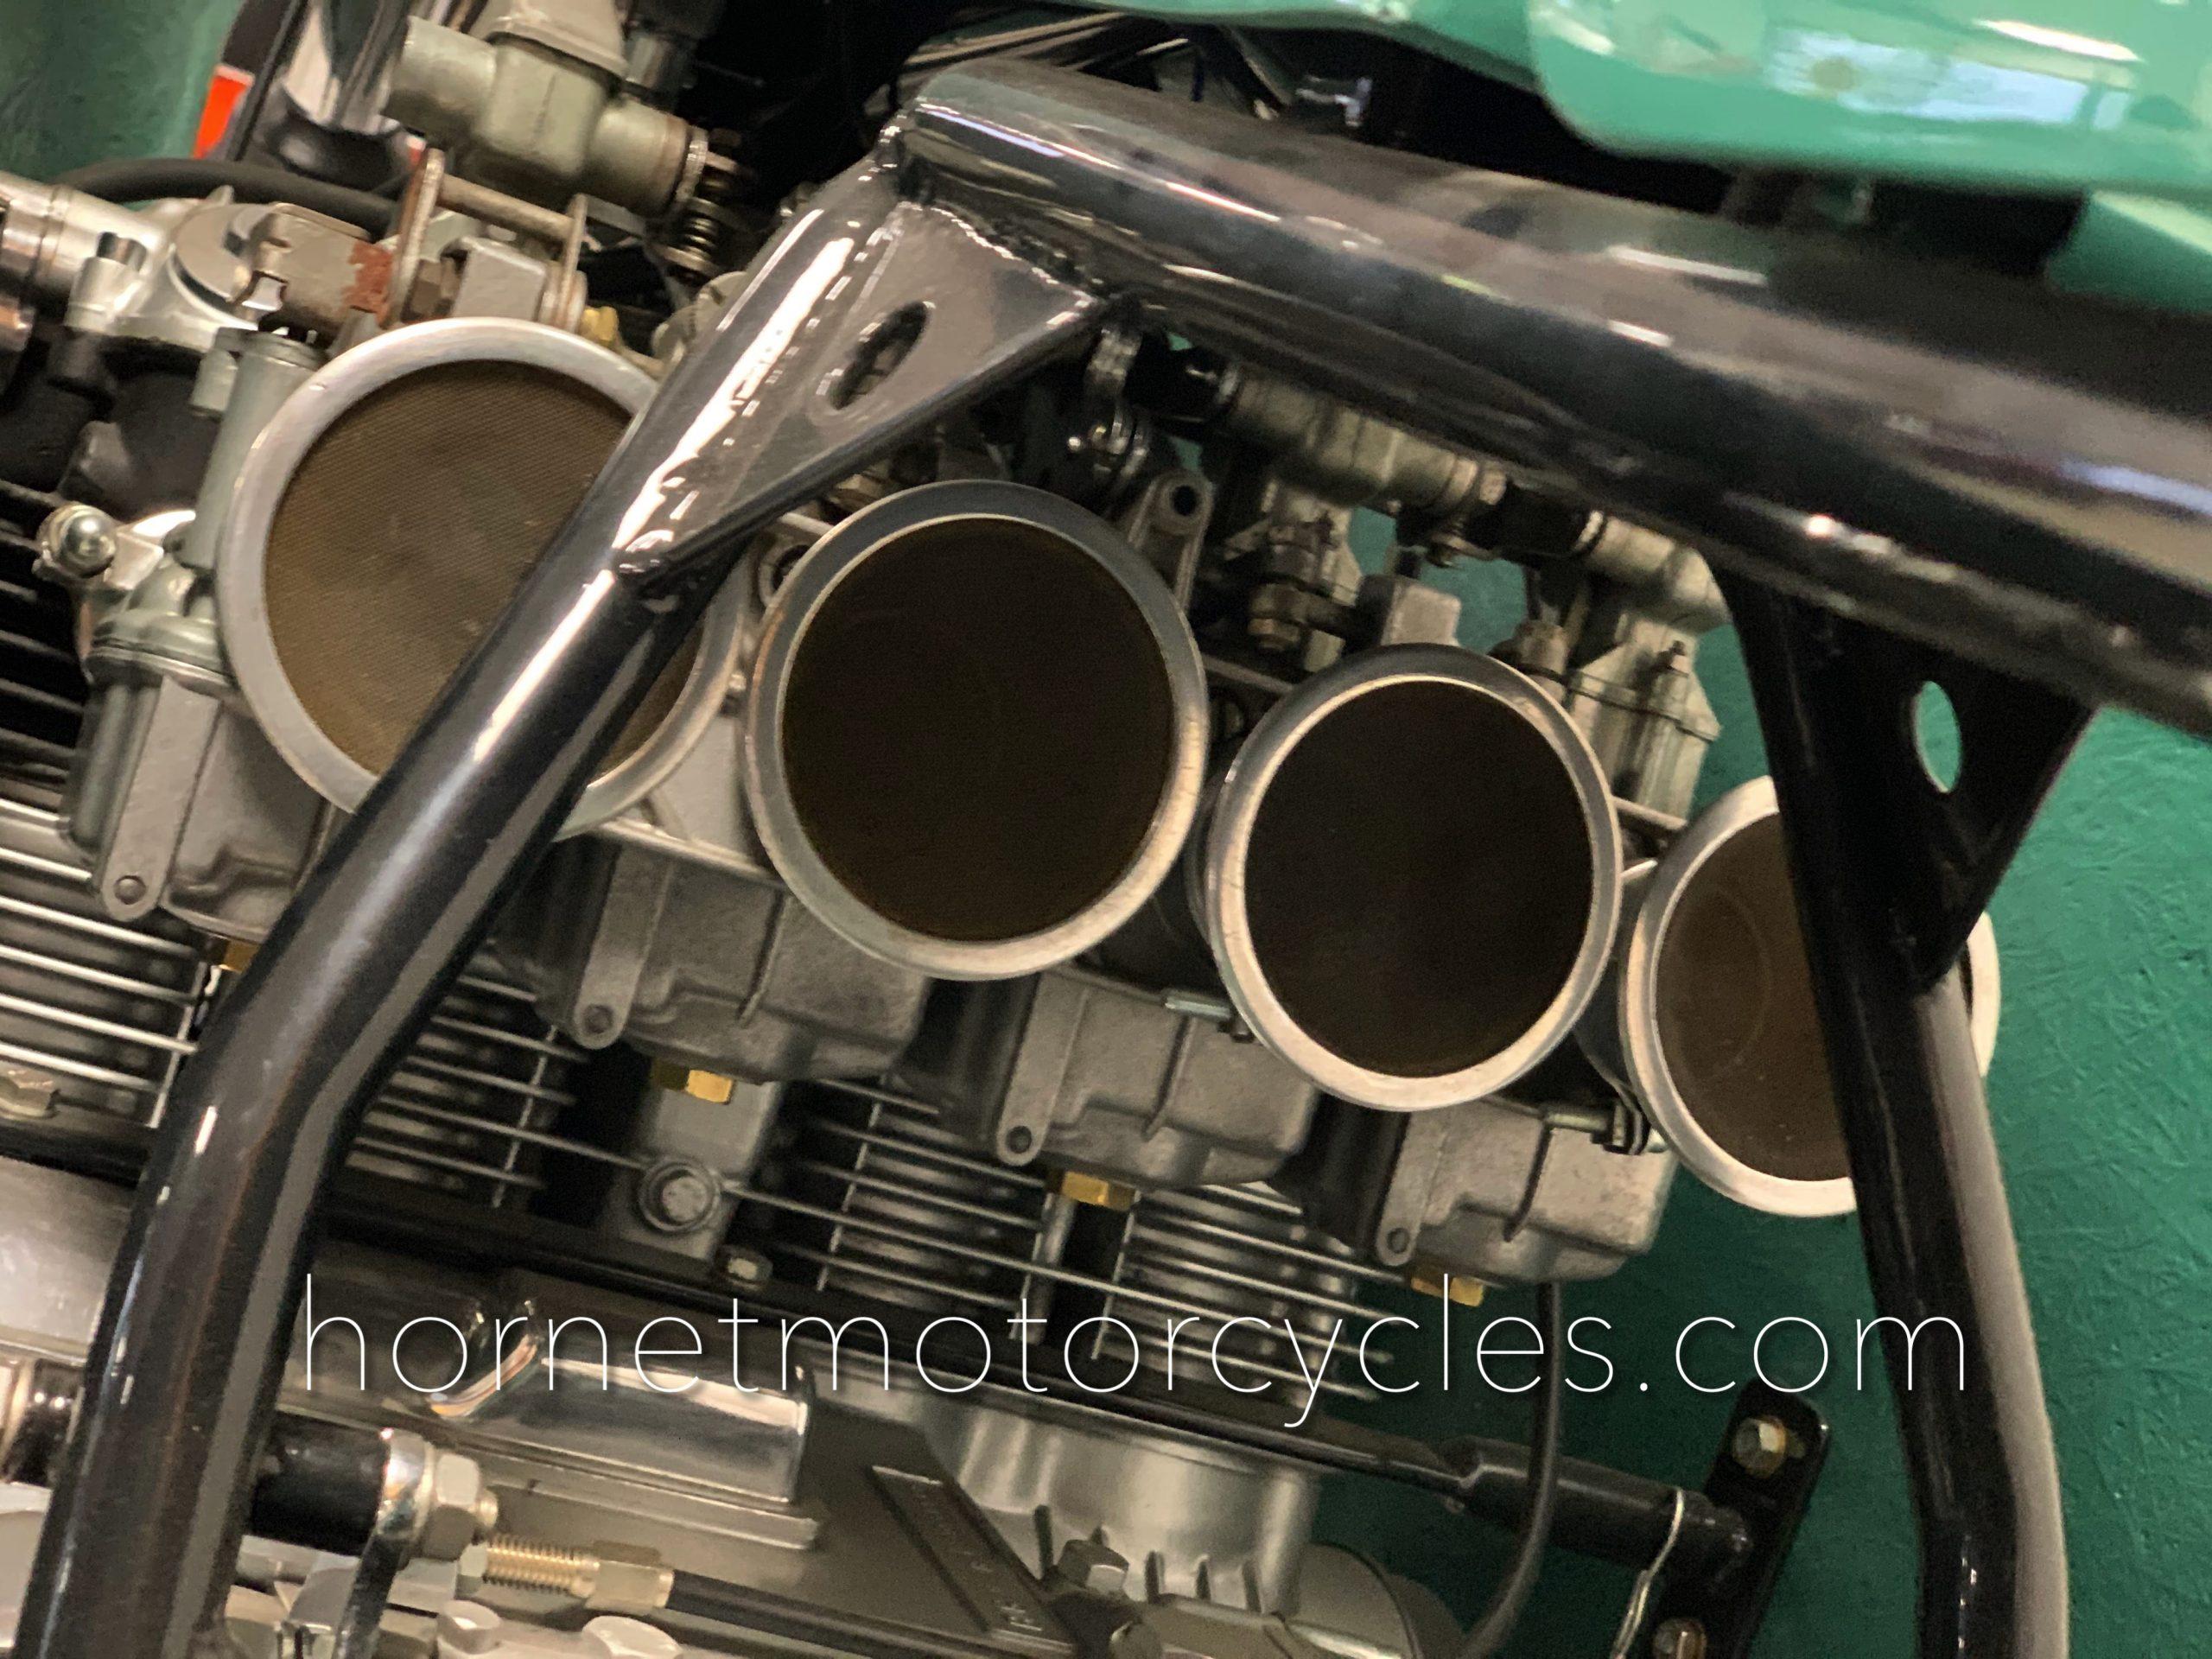 Benelli 500cc GP Racing Motorcycle